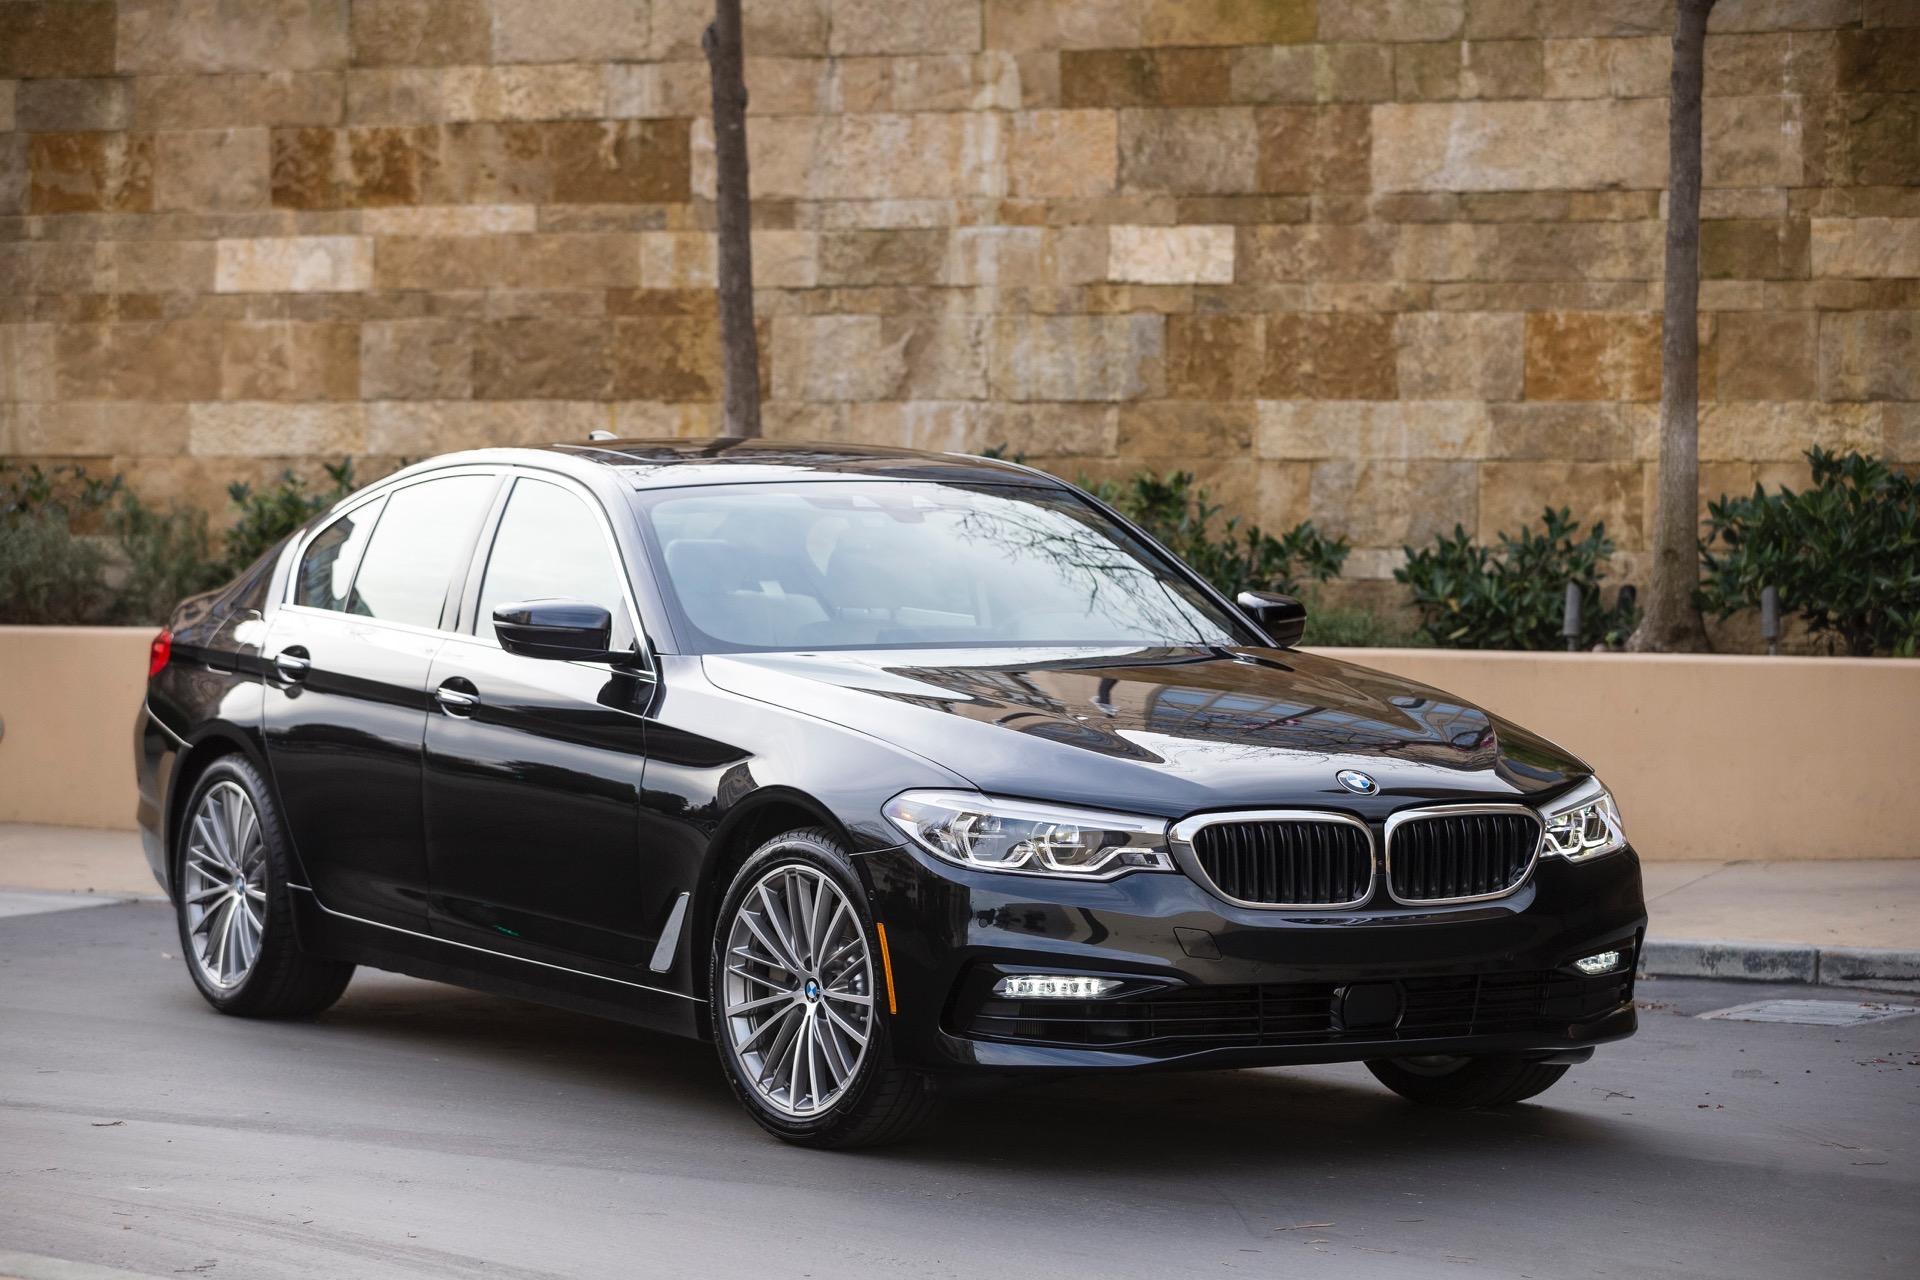 2017 BMW 5 Series G30153